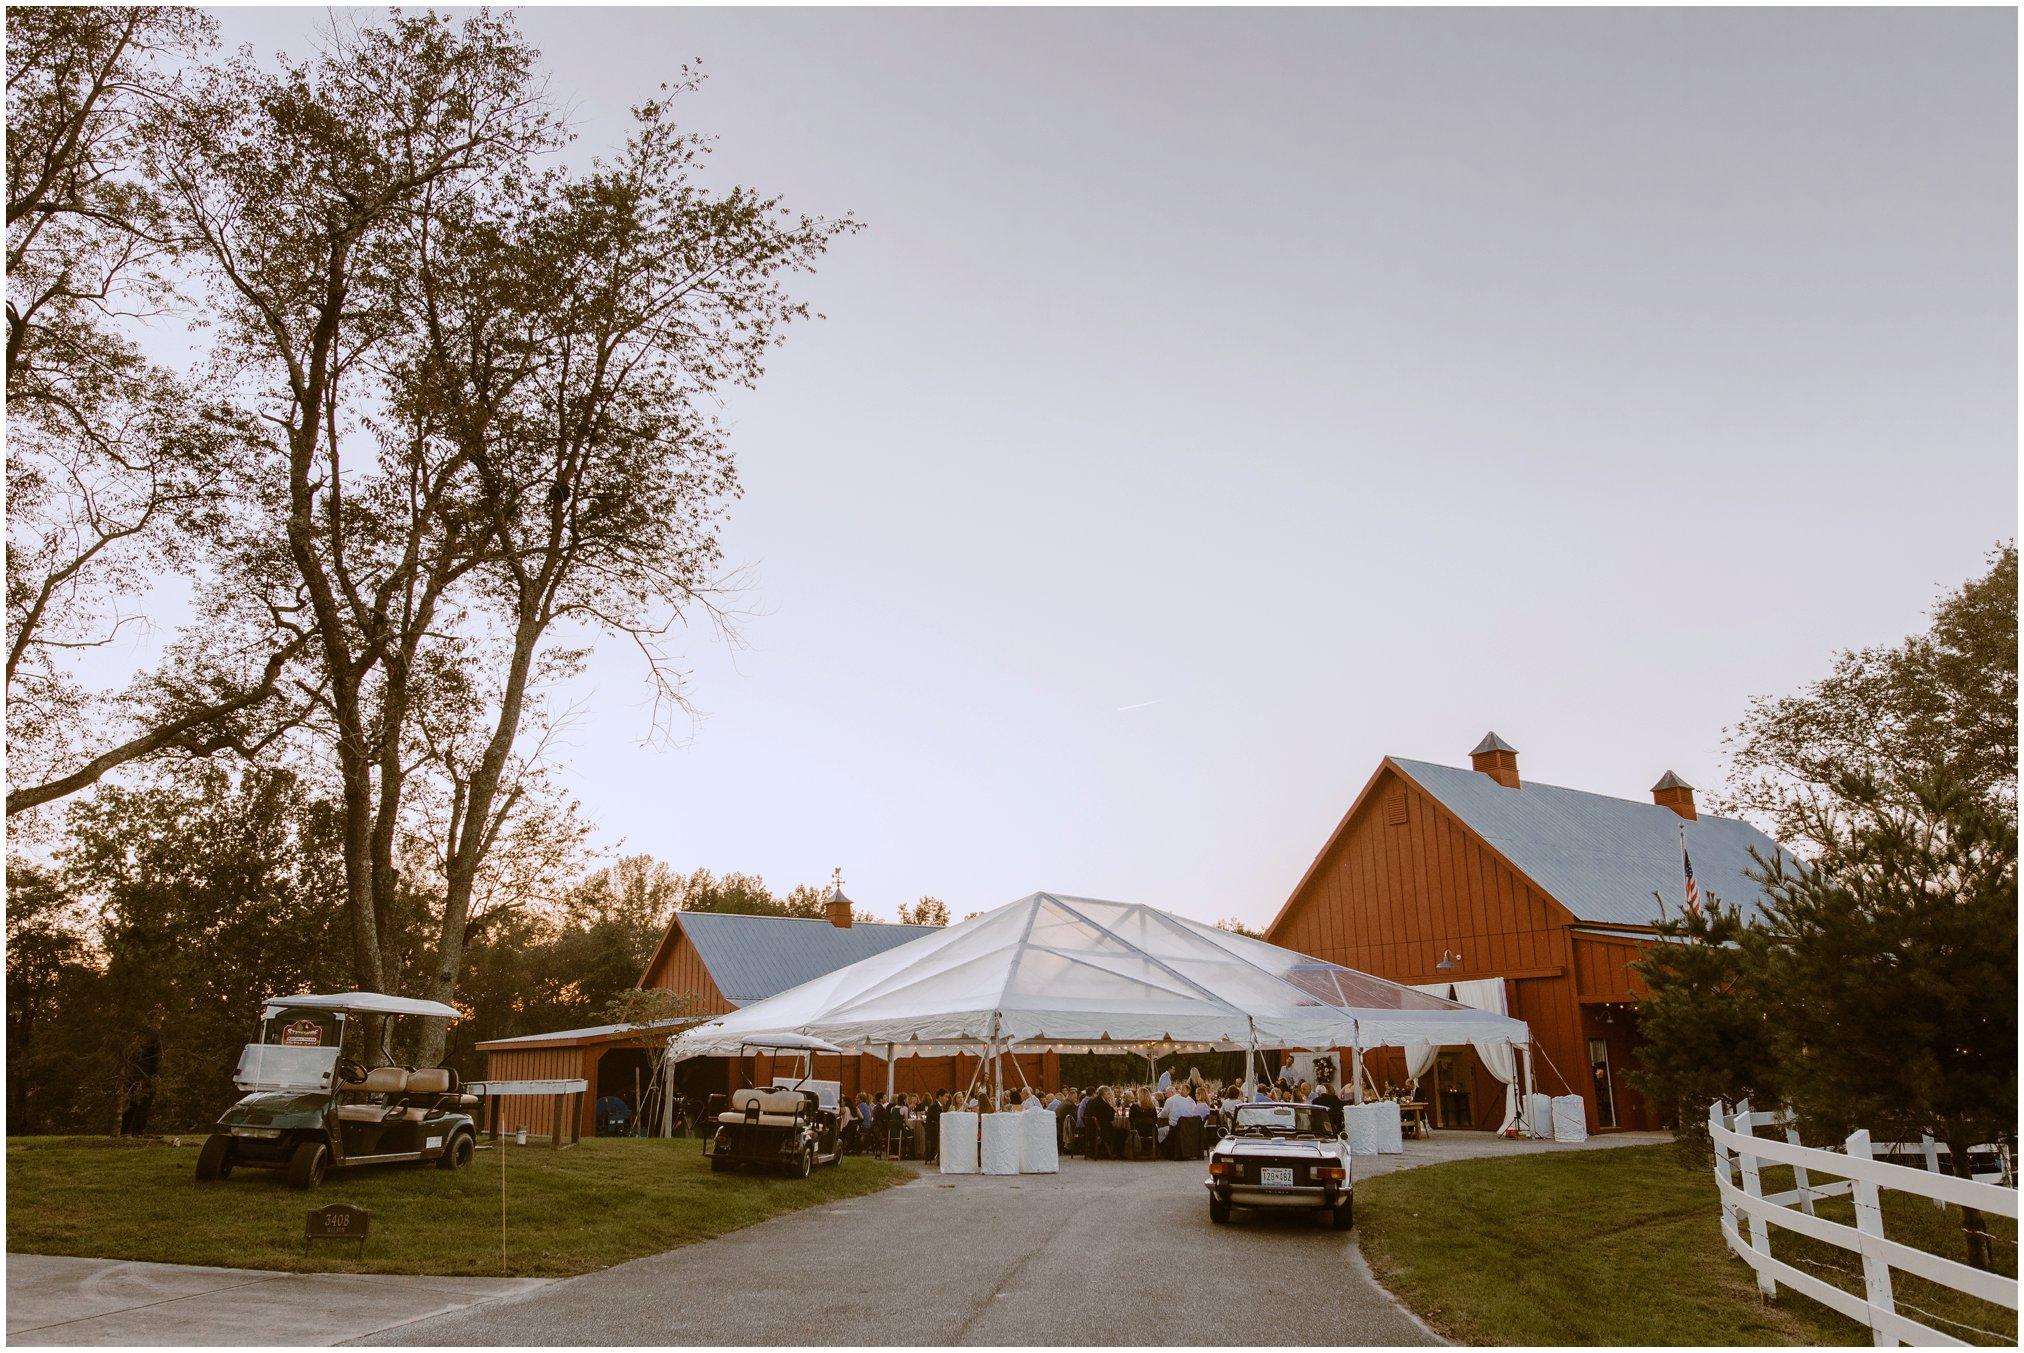 Annapolis Wedding Photographer, Kate Ann Photography, Timberlake Farm, Timberlake Farm Wedding, Annapolis Bride, Earthy Farm Wedding, Boho Farm Wedding, Outdoor Wedding Reception